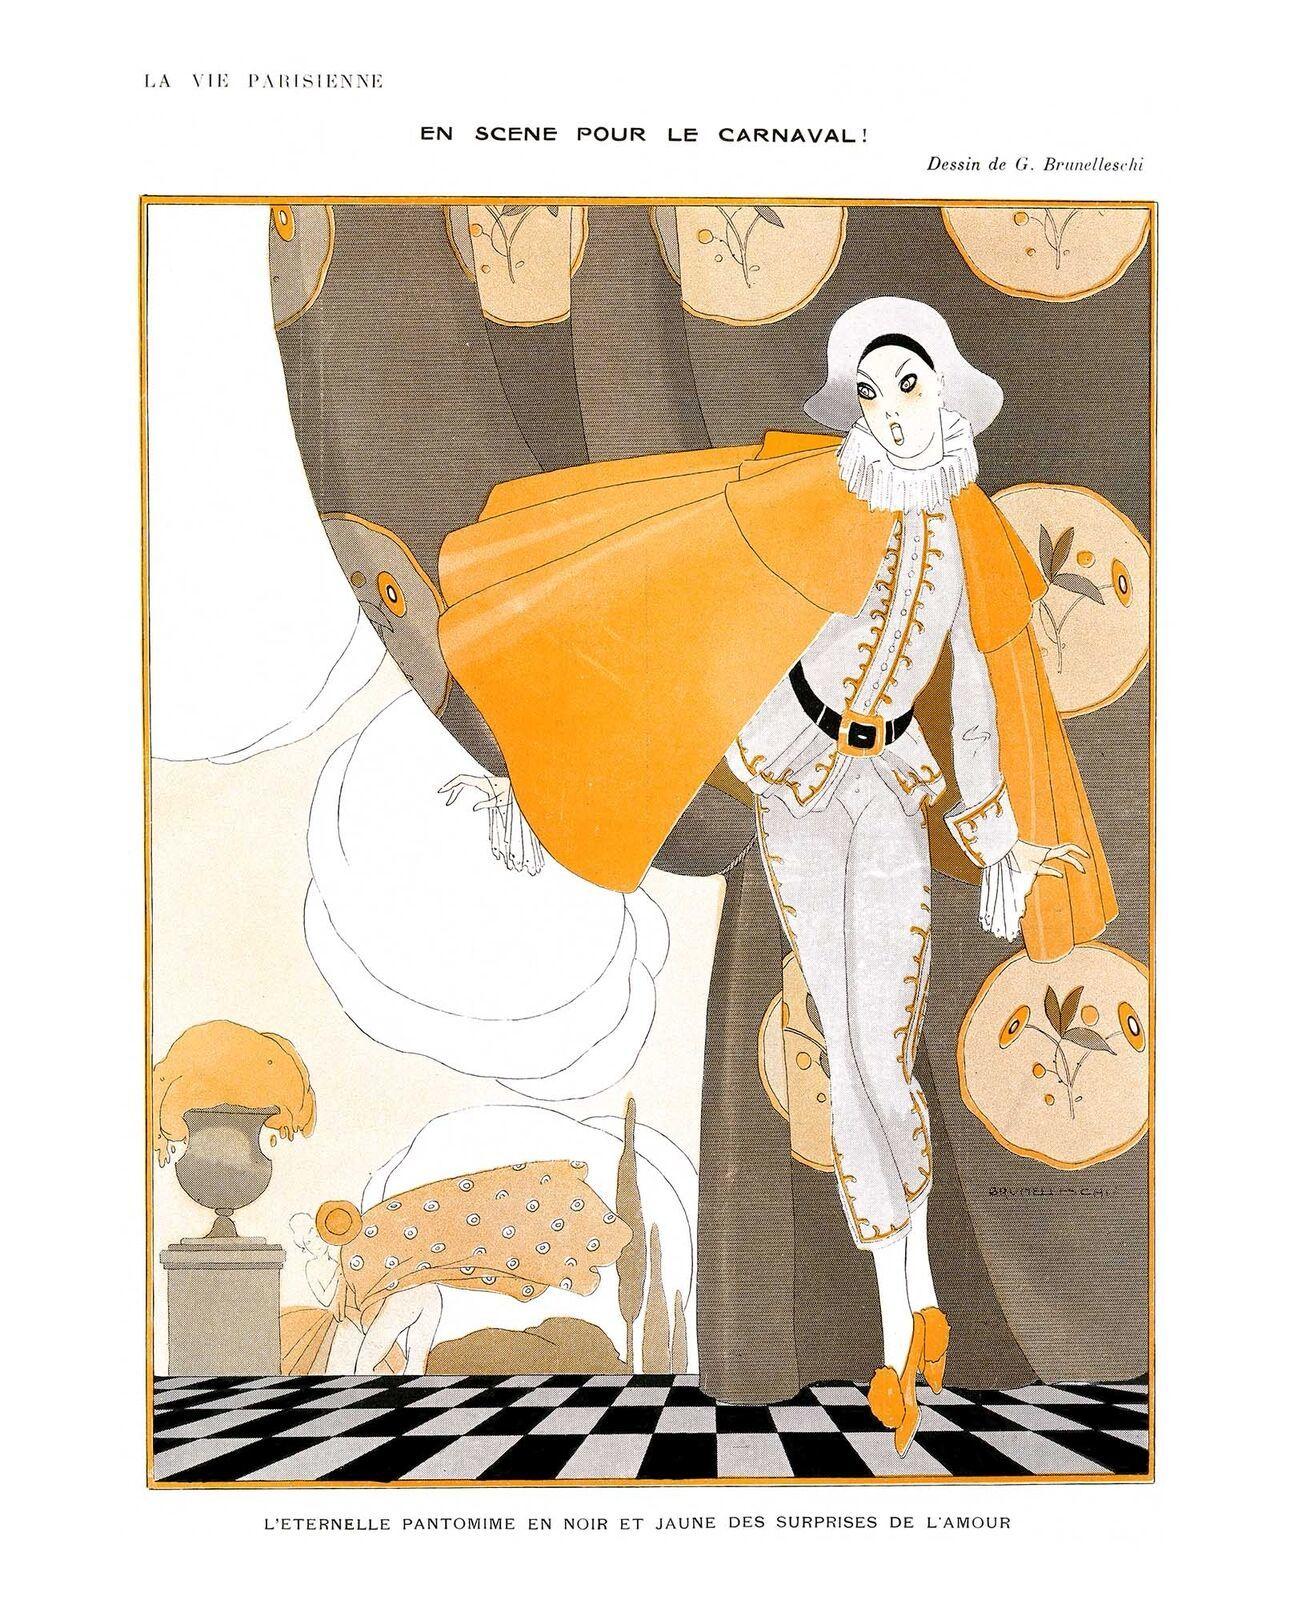 French Pinups: La Vie Parisienne - Girl in Cape - Brunelleschi - 1914 - $12.95 - $19.95